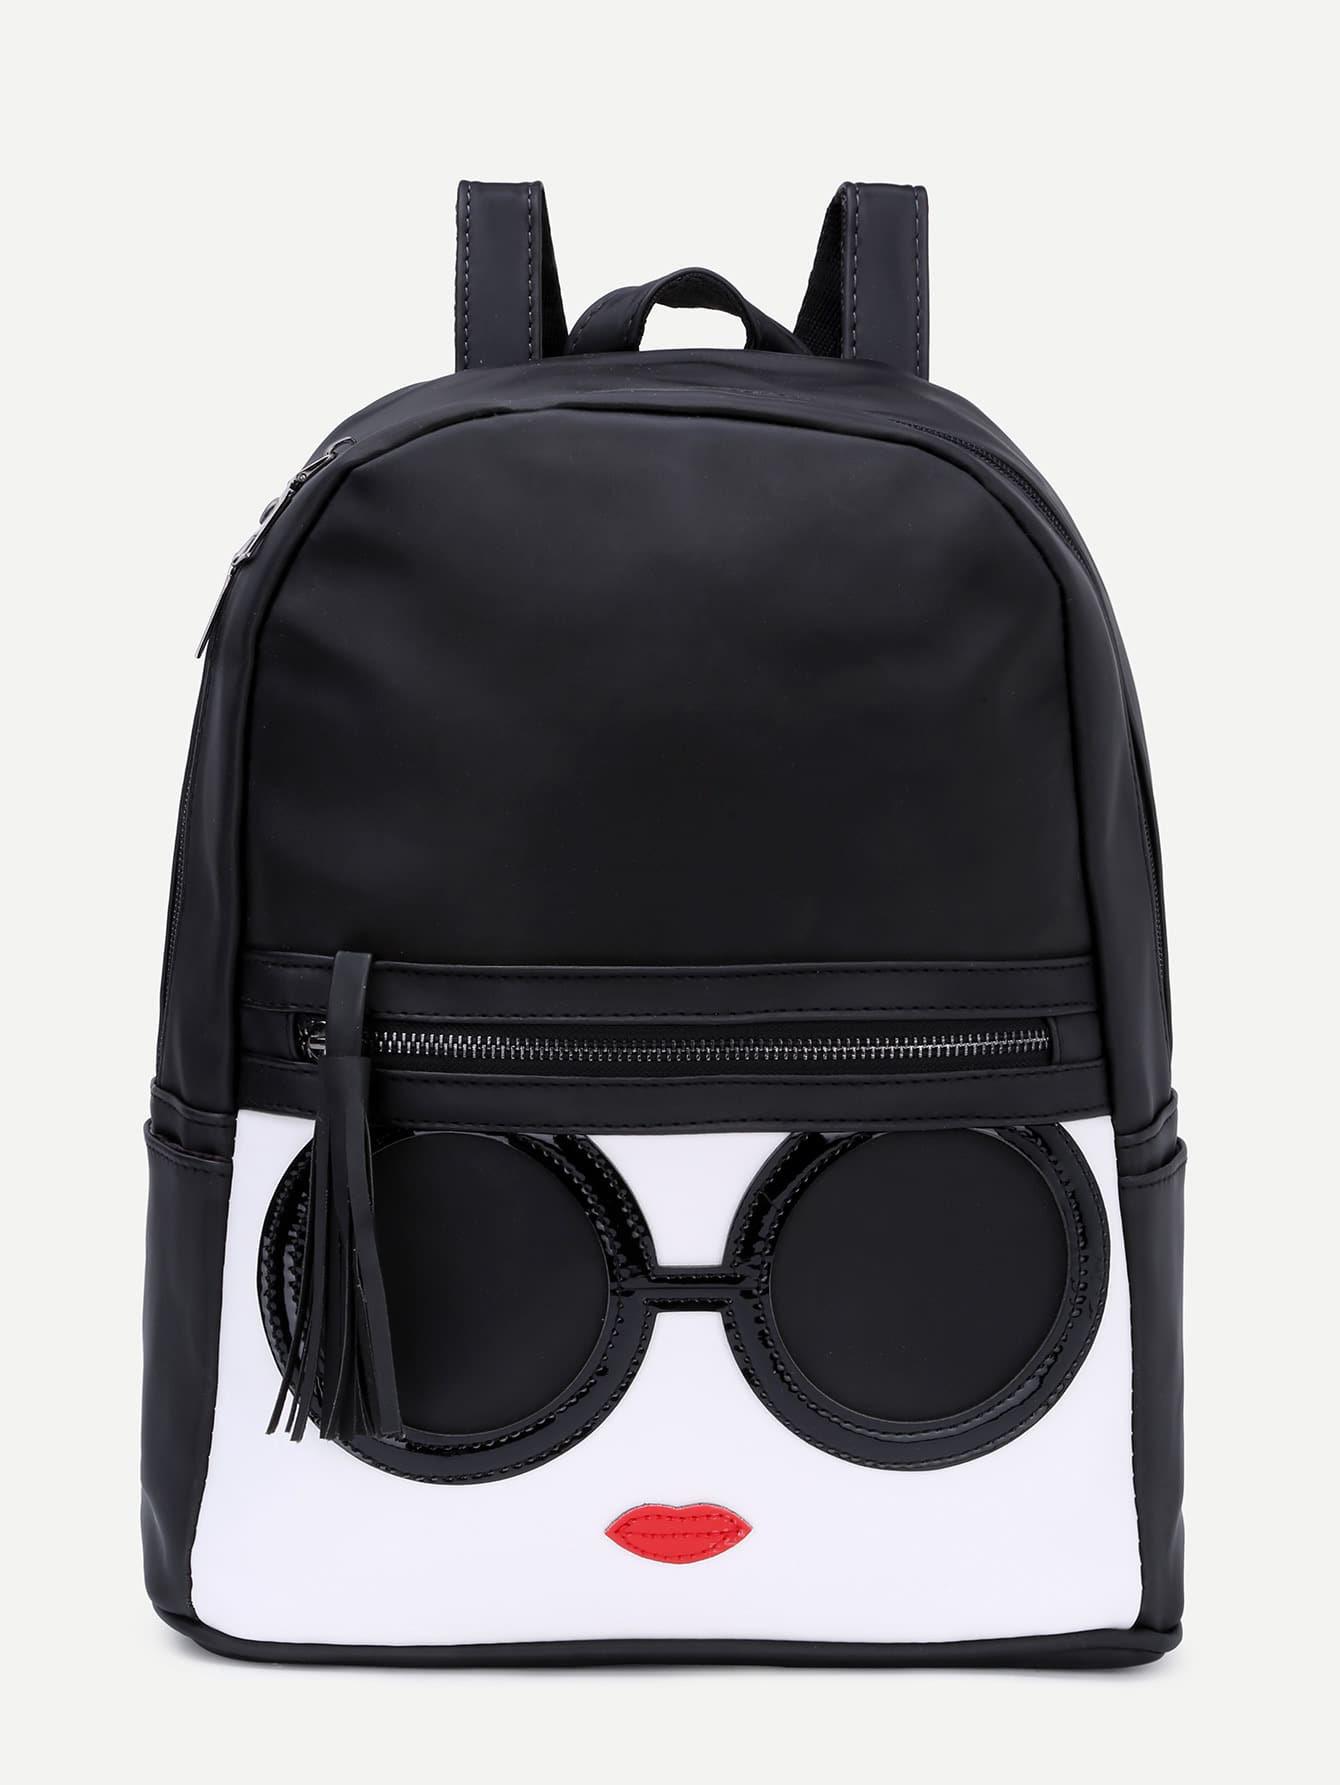 bag160818904_2